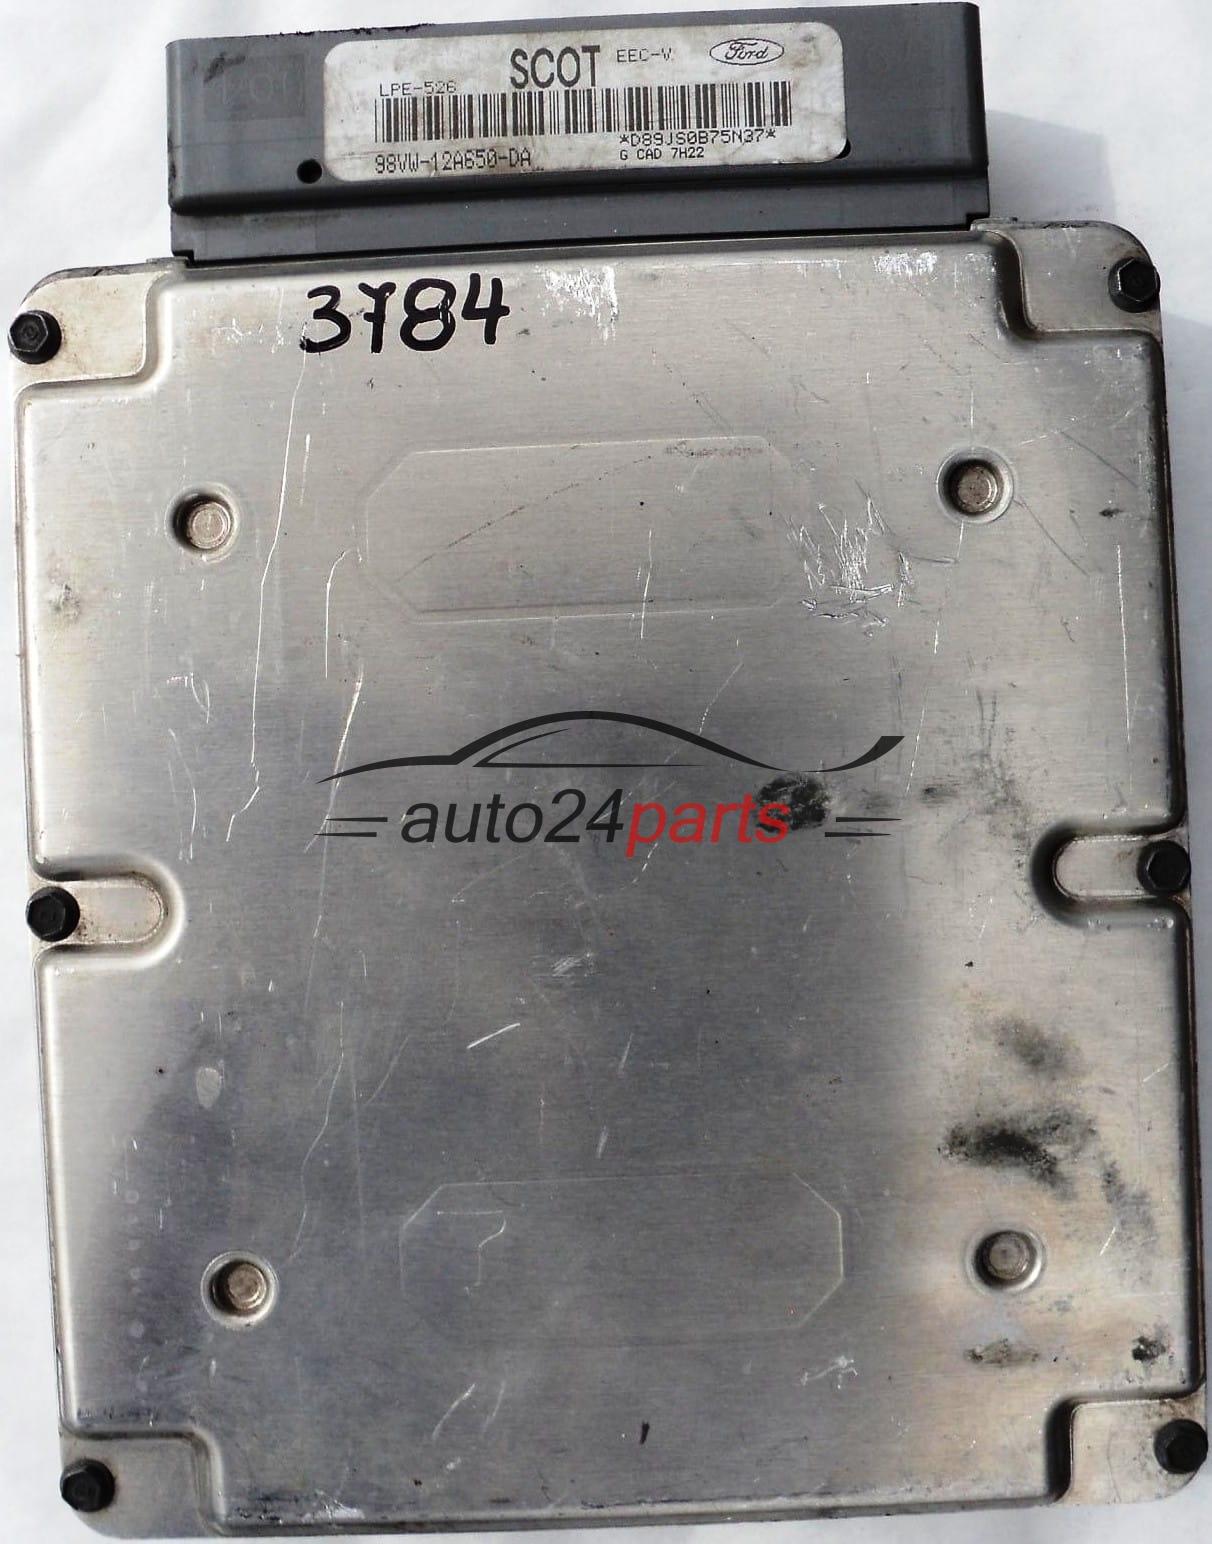 ECU ENGINE CONTROLLER FORD GALAXY 2 0 98VW12A650DA SCOT LPE-526 EEC-V,  98VW-12A650-DA